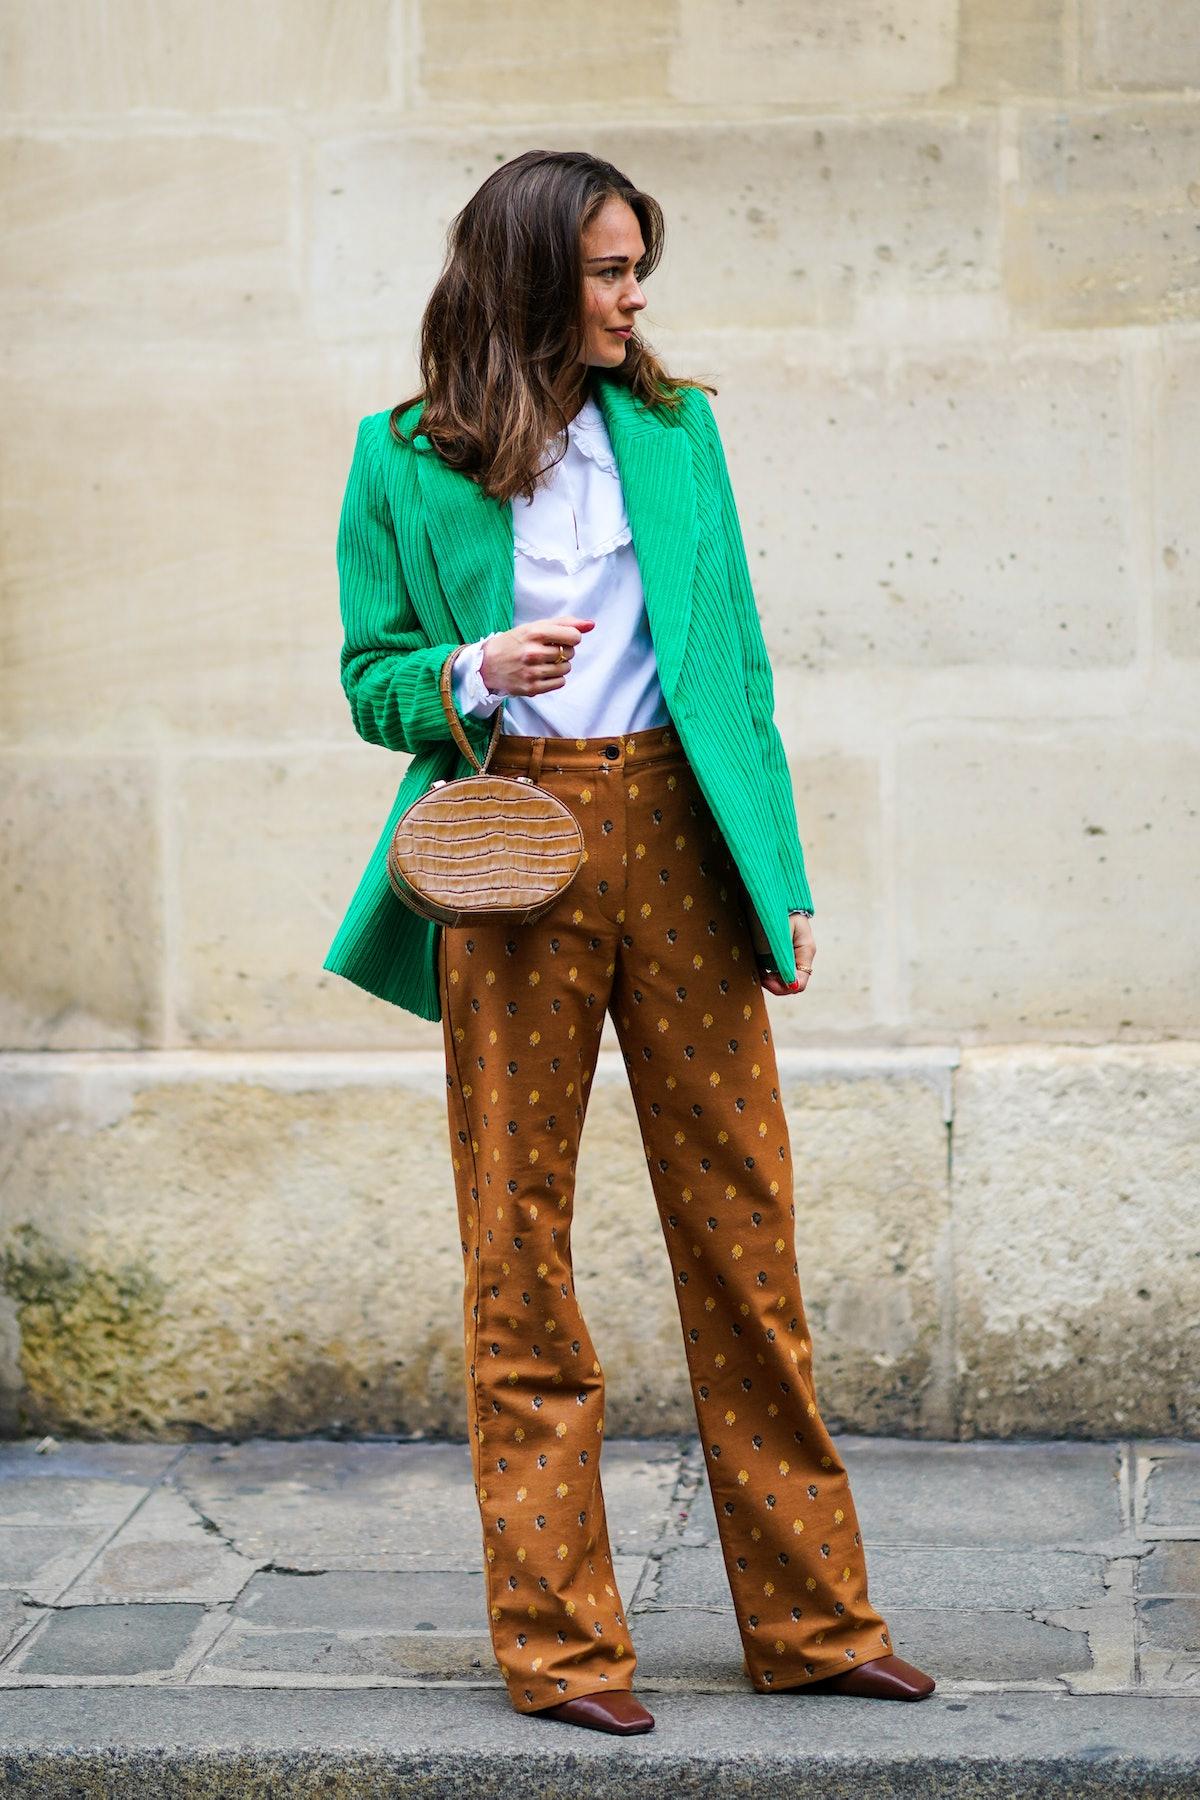 Therese Hellström wears printed pants